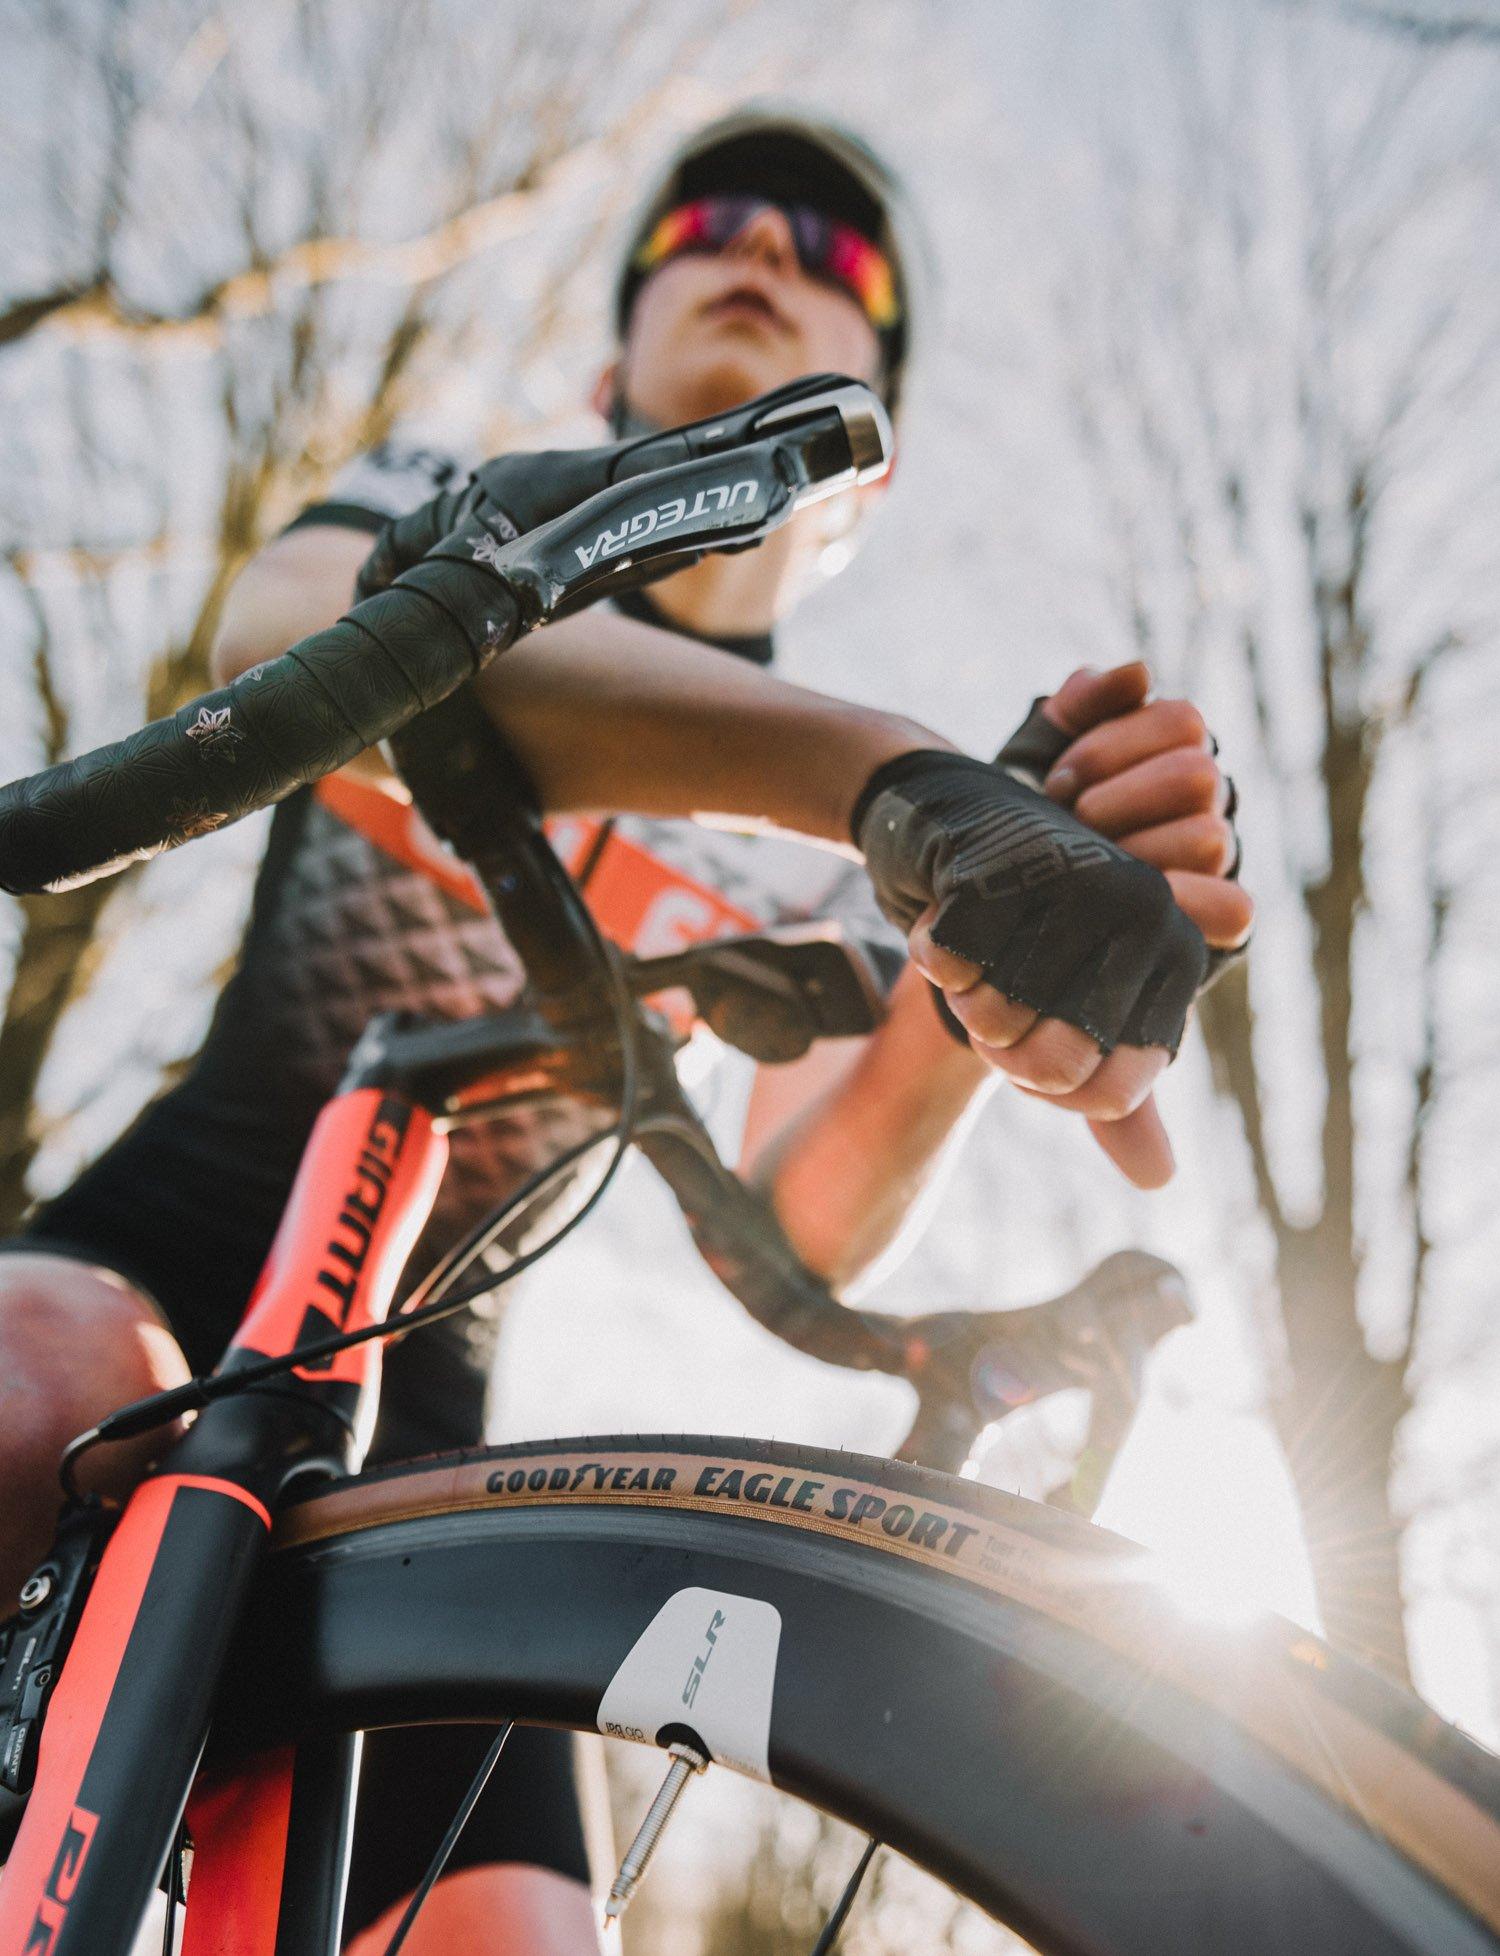 Goodyear Eagle Sport Tan Wall bike tire